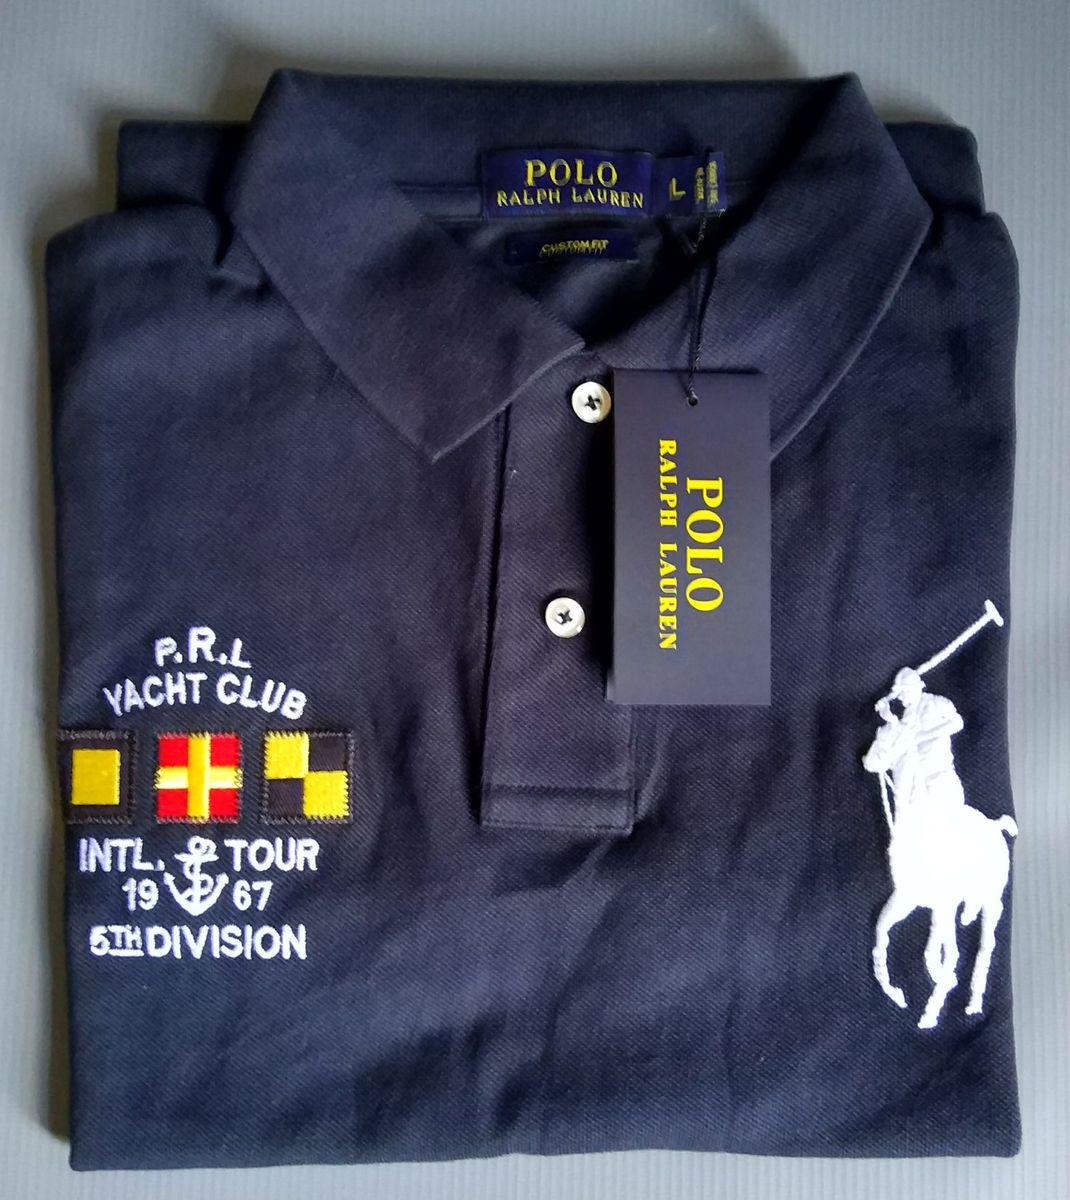 camisa polo ralph lauren original importada - camisas polo ralph lauren a79e1fbb5e5